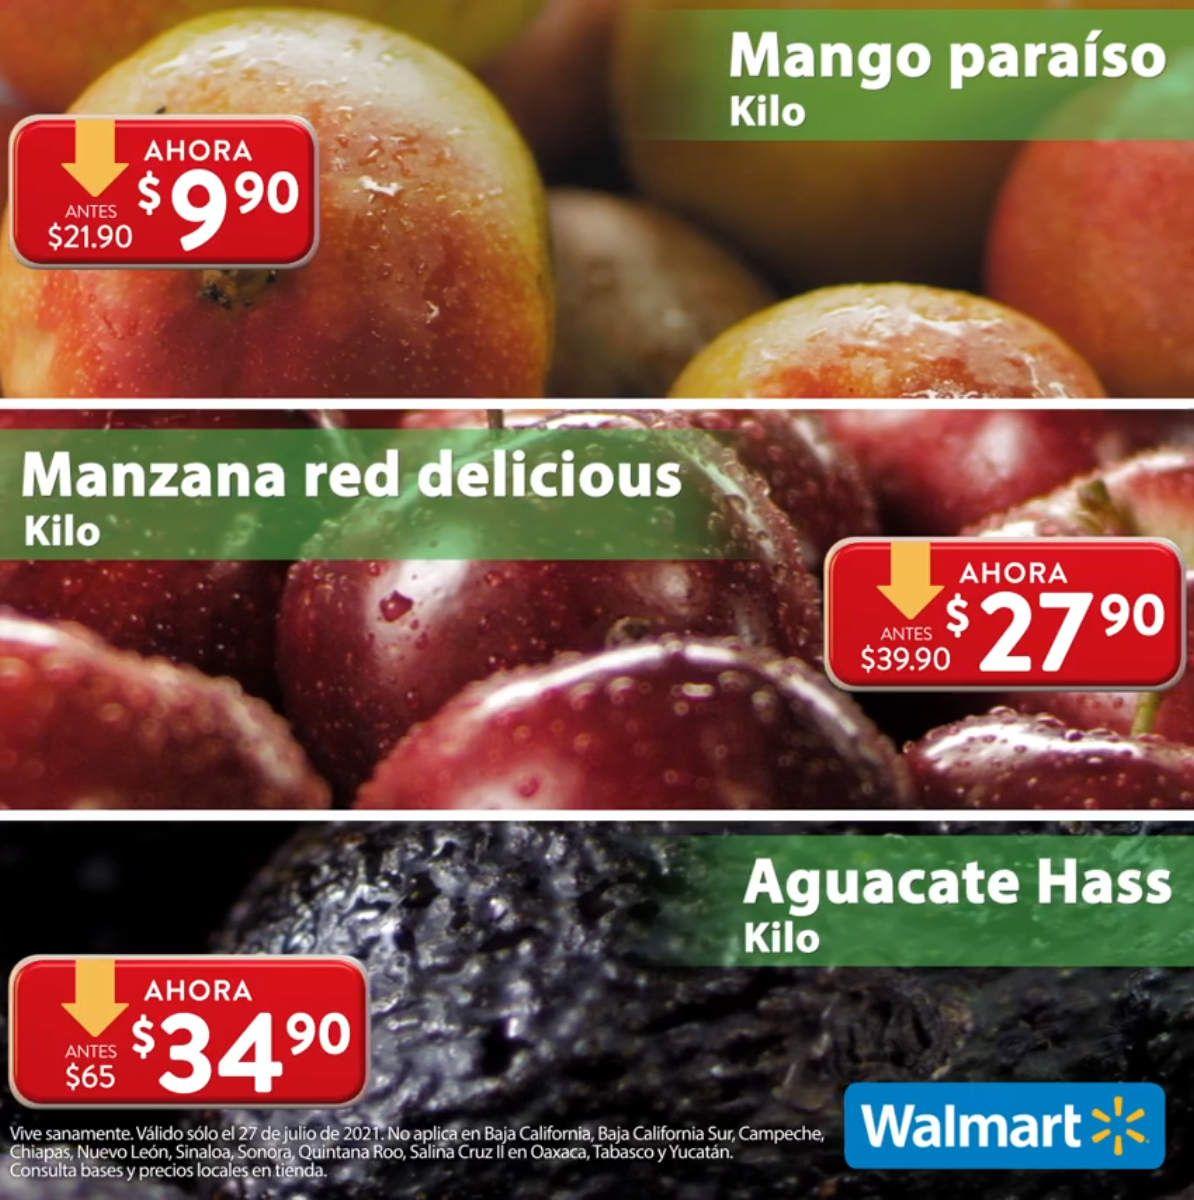 Walmart: Martes de Frescura 27 Julio: Mango Paraíso $9.90 kg... Manzana Red $27.90 kg... Aguacate $34.90 kg.